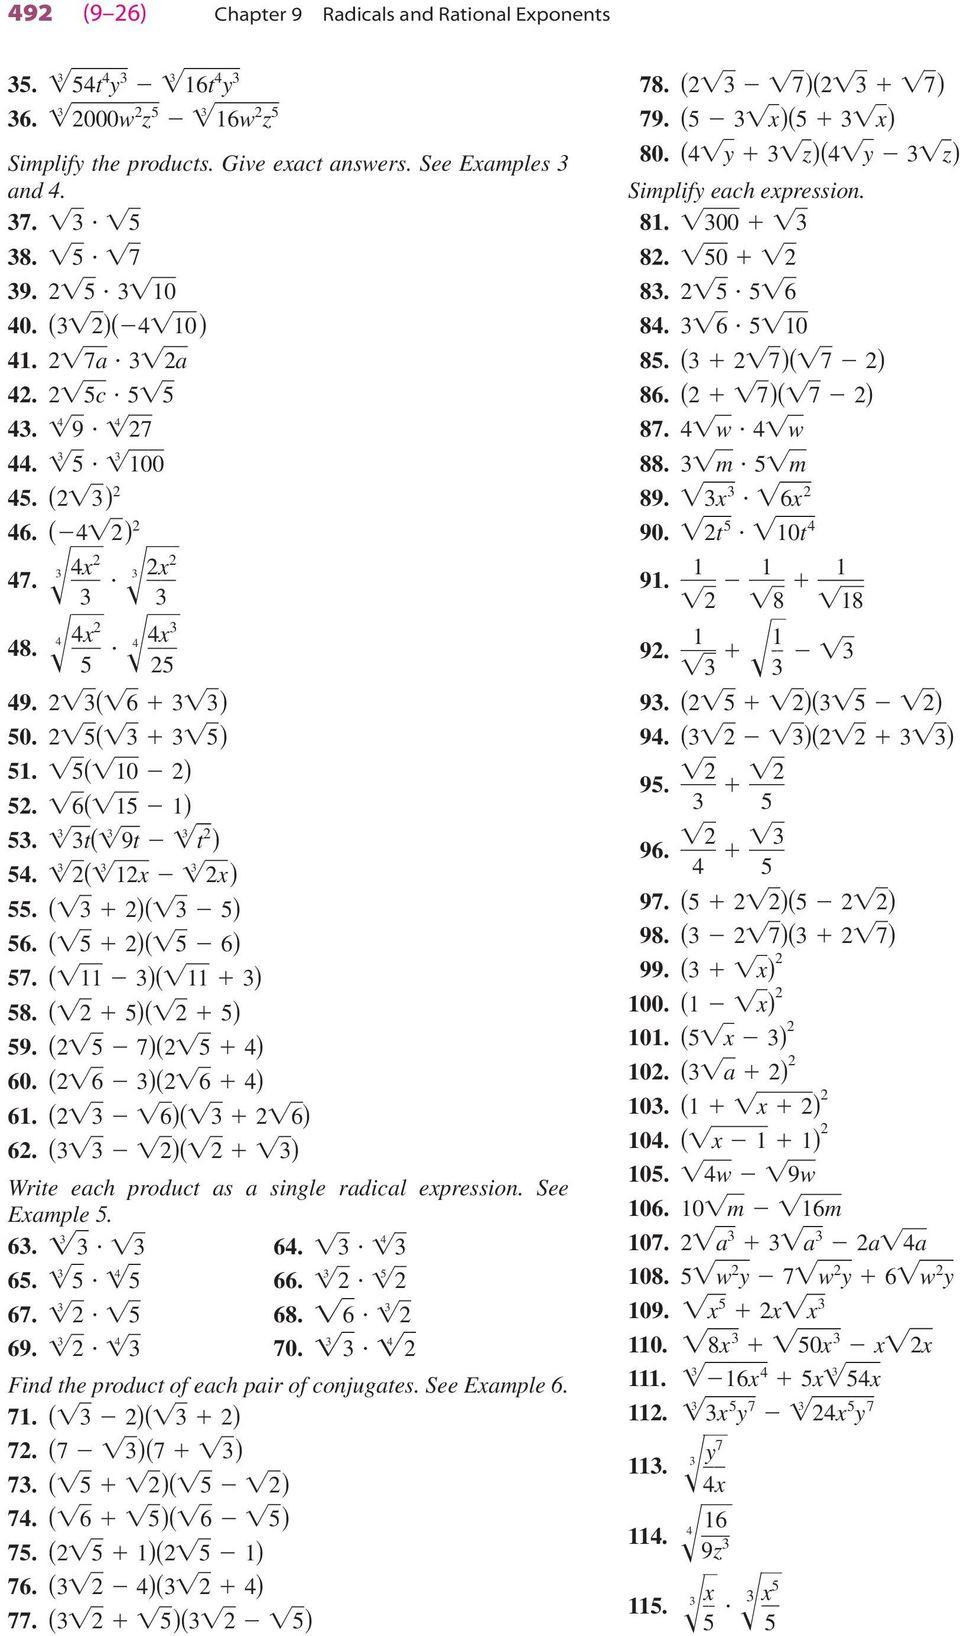 Radical and Rational Exponents Worksheet Equations with Rational Exponents Worksheet A 9 3 Answers